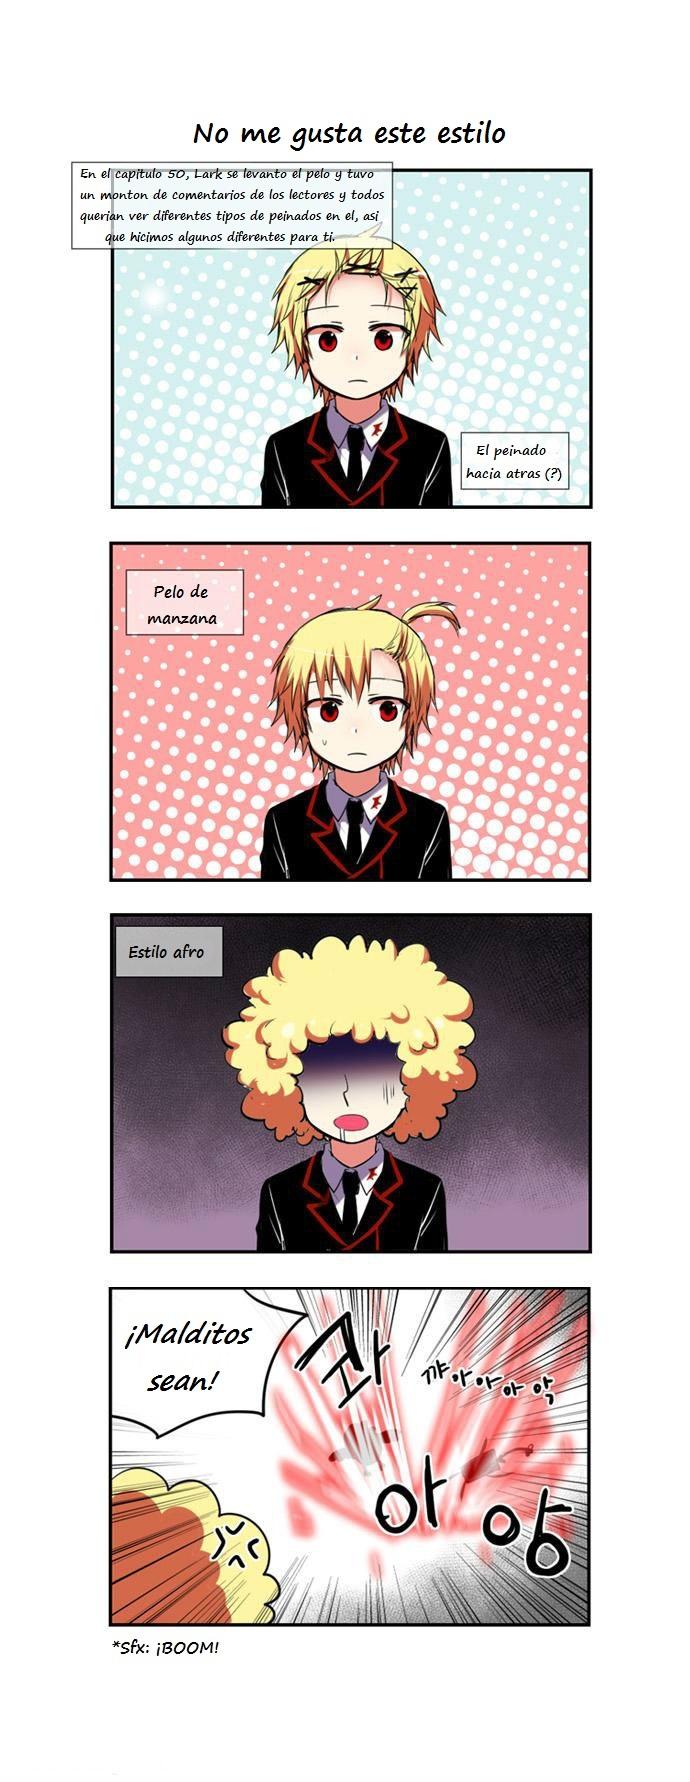 http://c5.ninemanga.com/es_manga/4/836/454378/6a7fe0316d661644119345f287aaf300.jpg Page 5